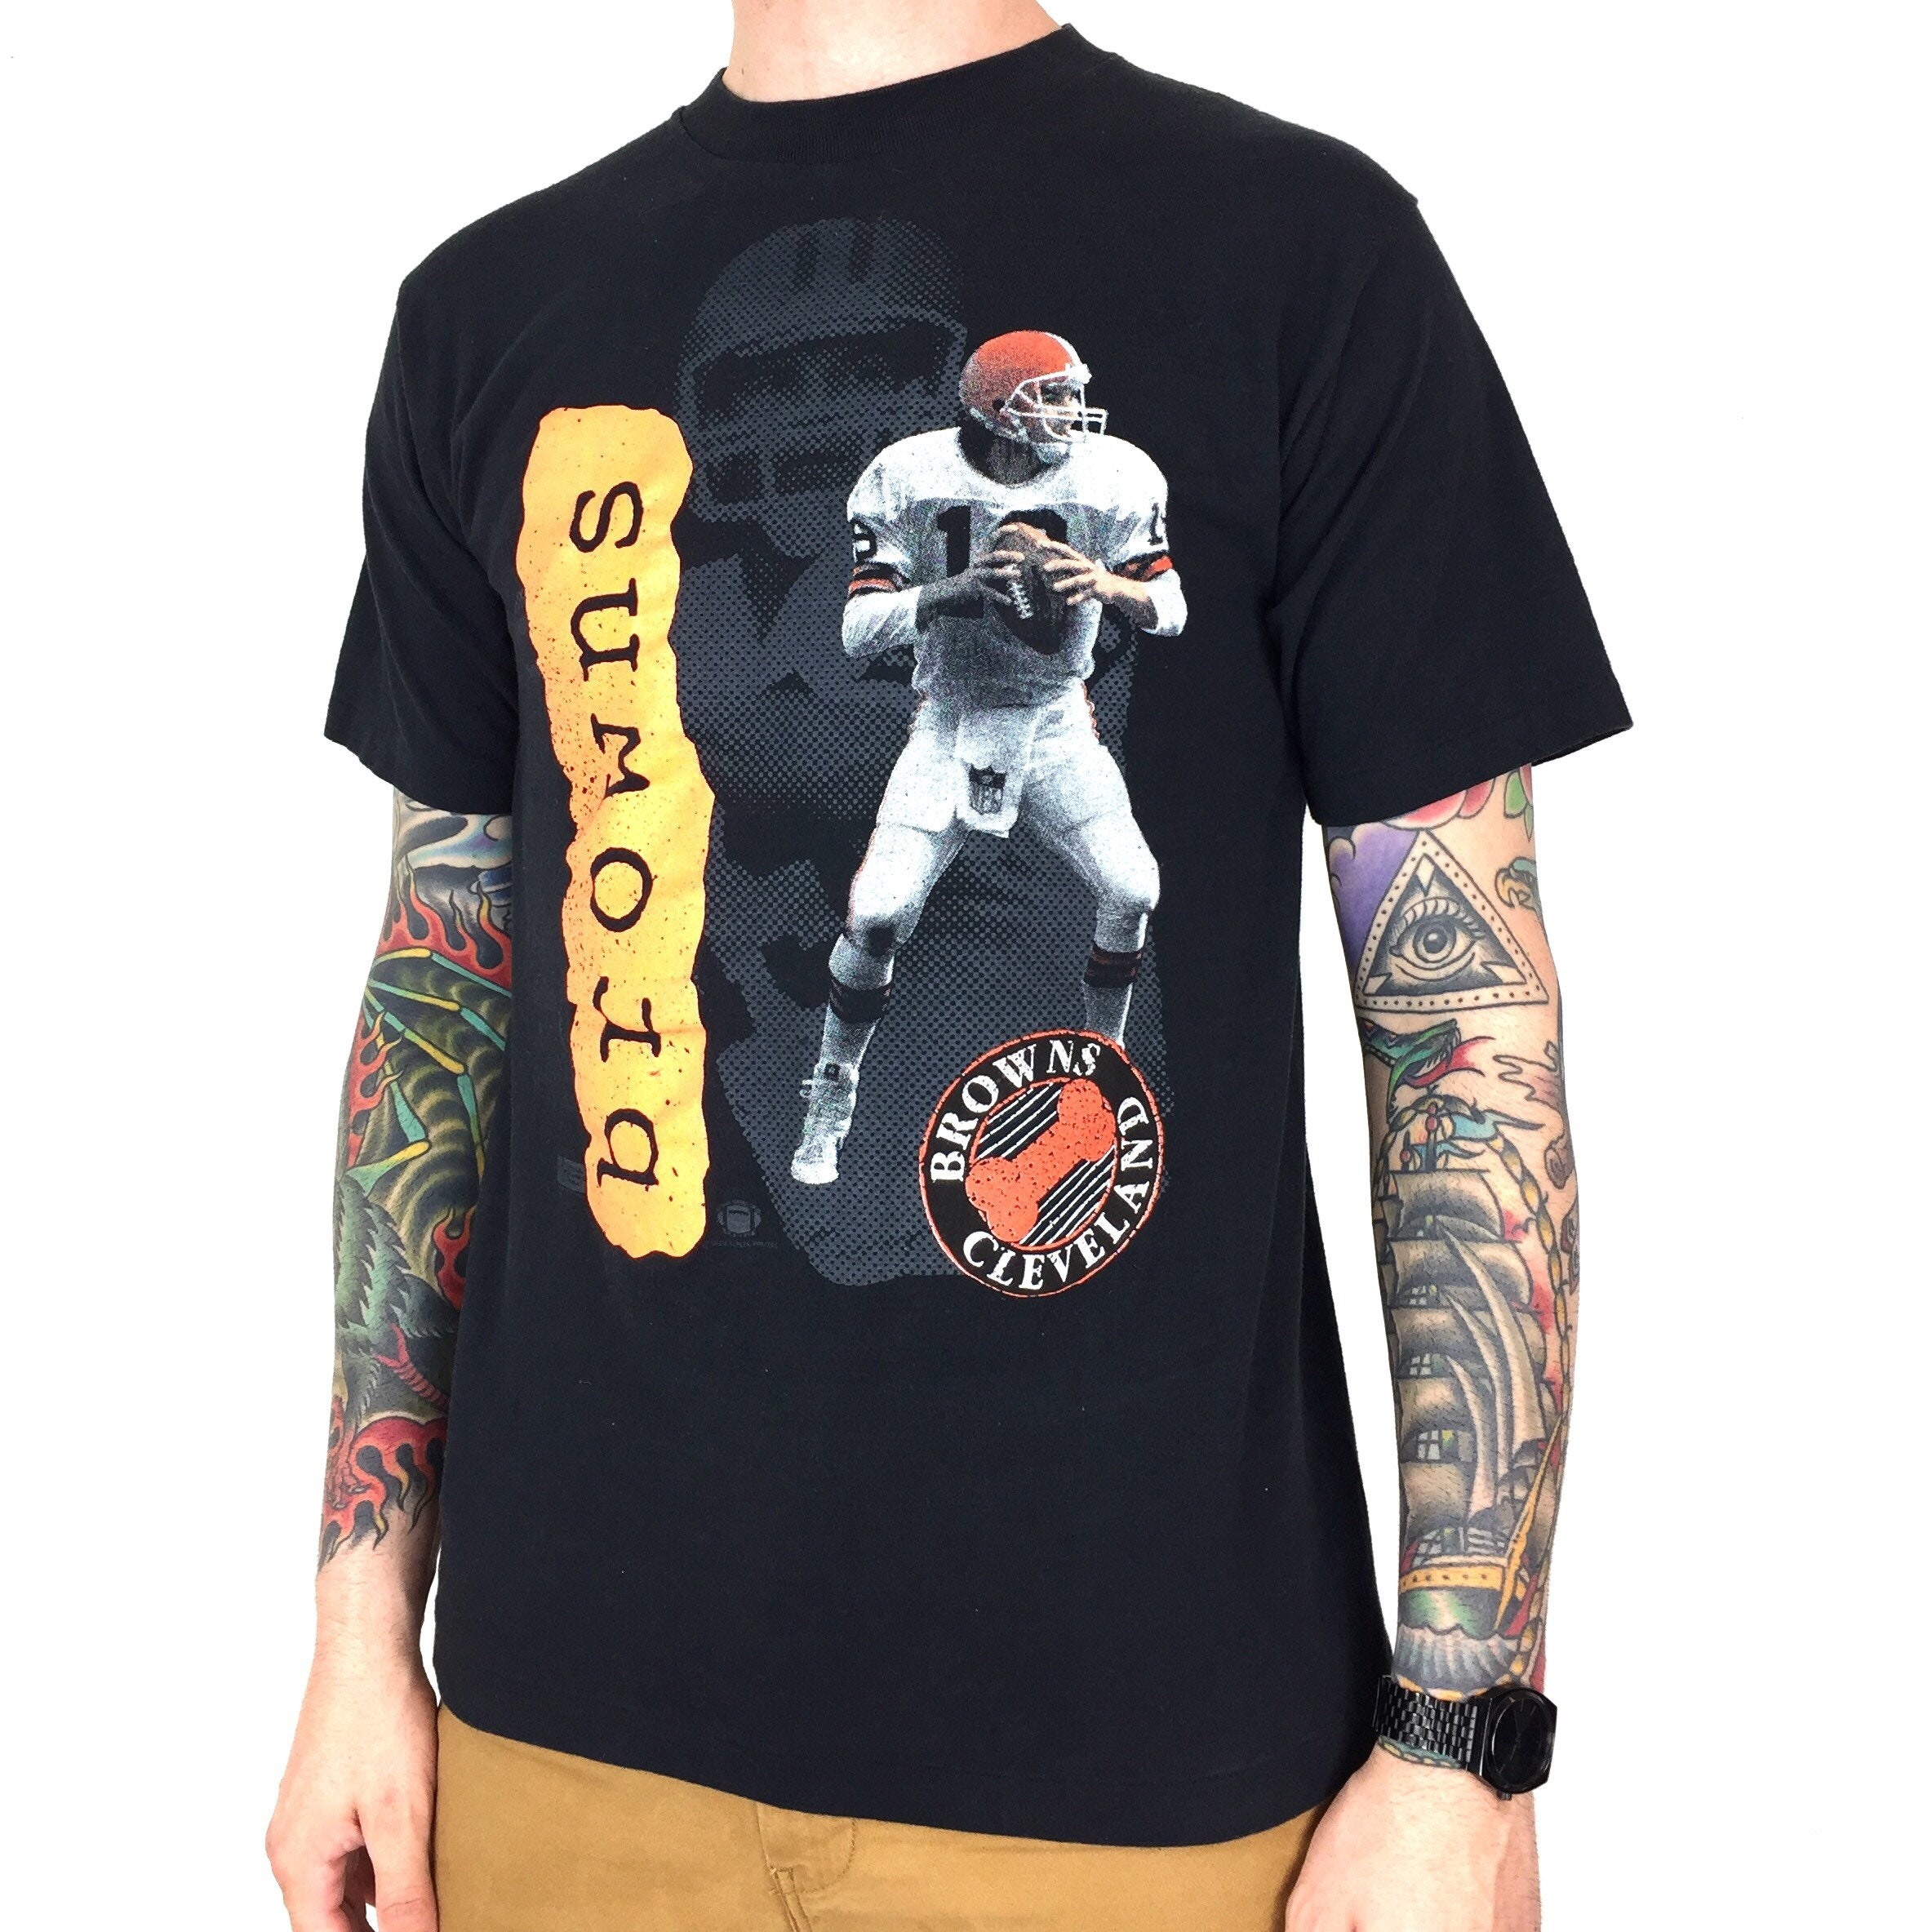 f0a7575e2d6 Vintage 90s NFL Cleveland Browns Bernie Kosar Salem Sportswear | Etsy